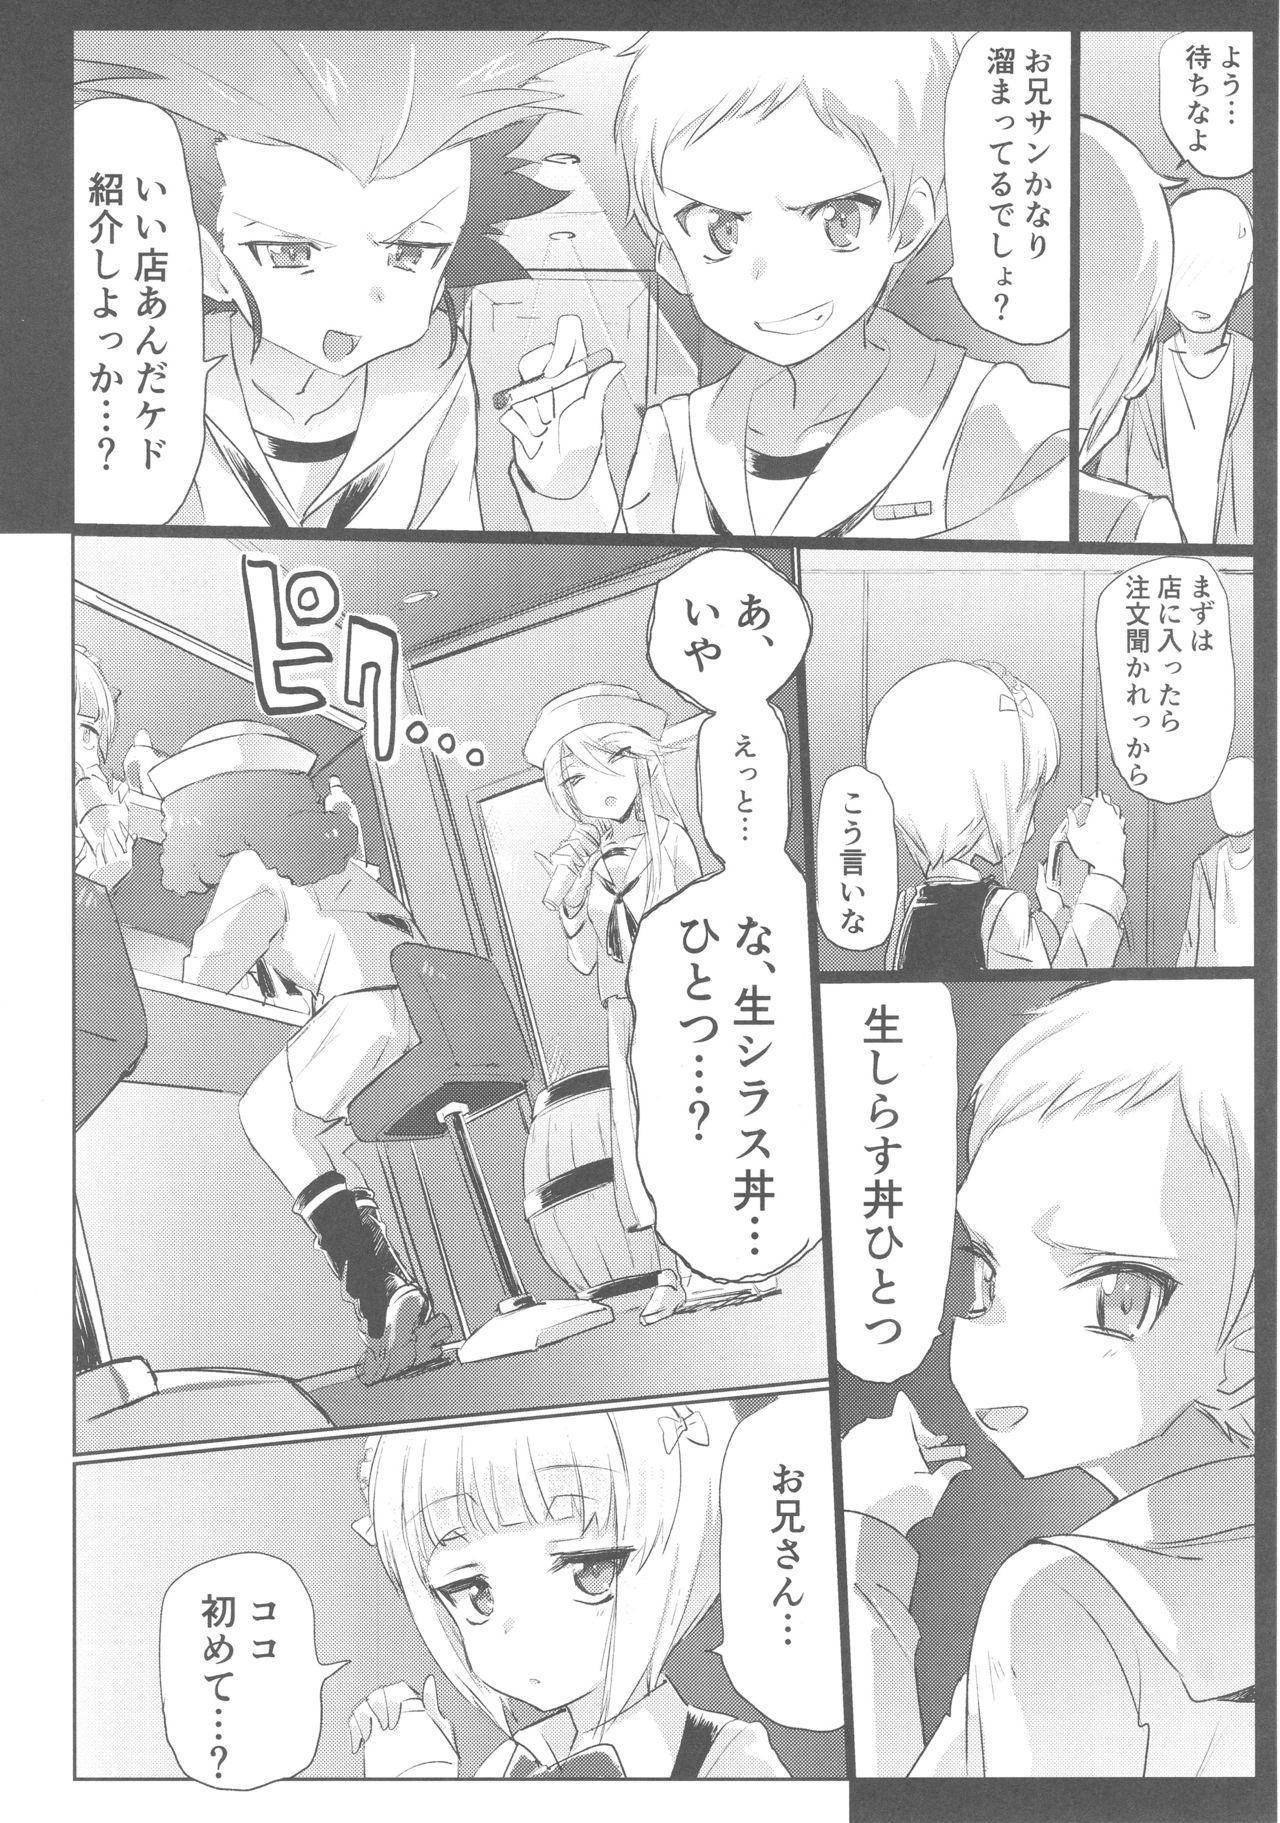 Mise ni Haittara Mazu Shimei Shina 2